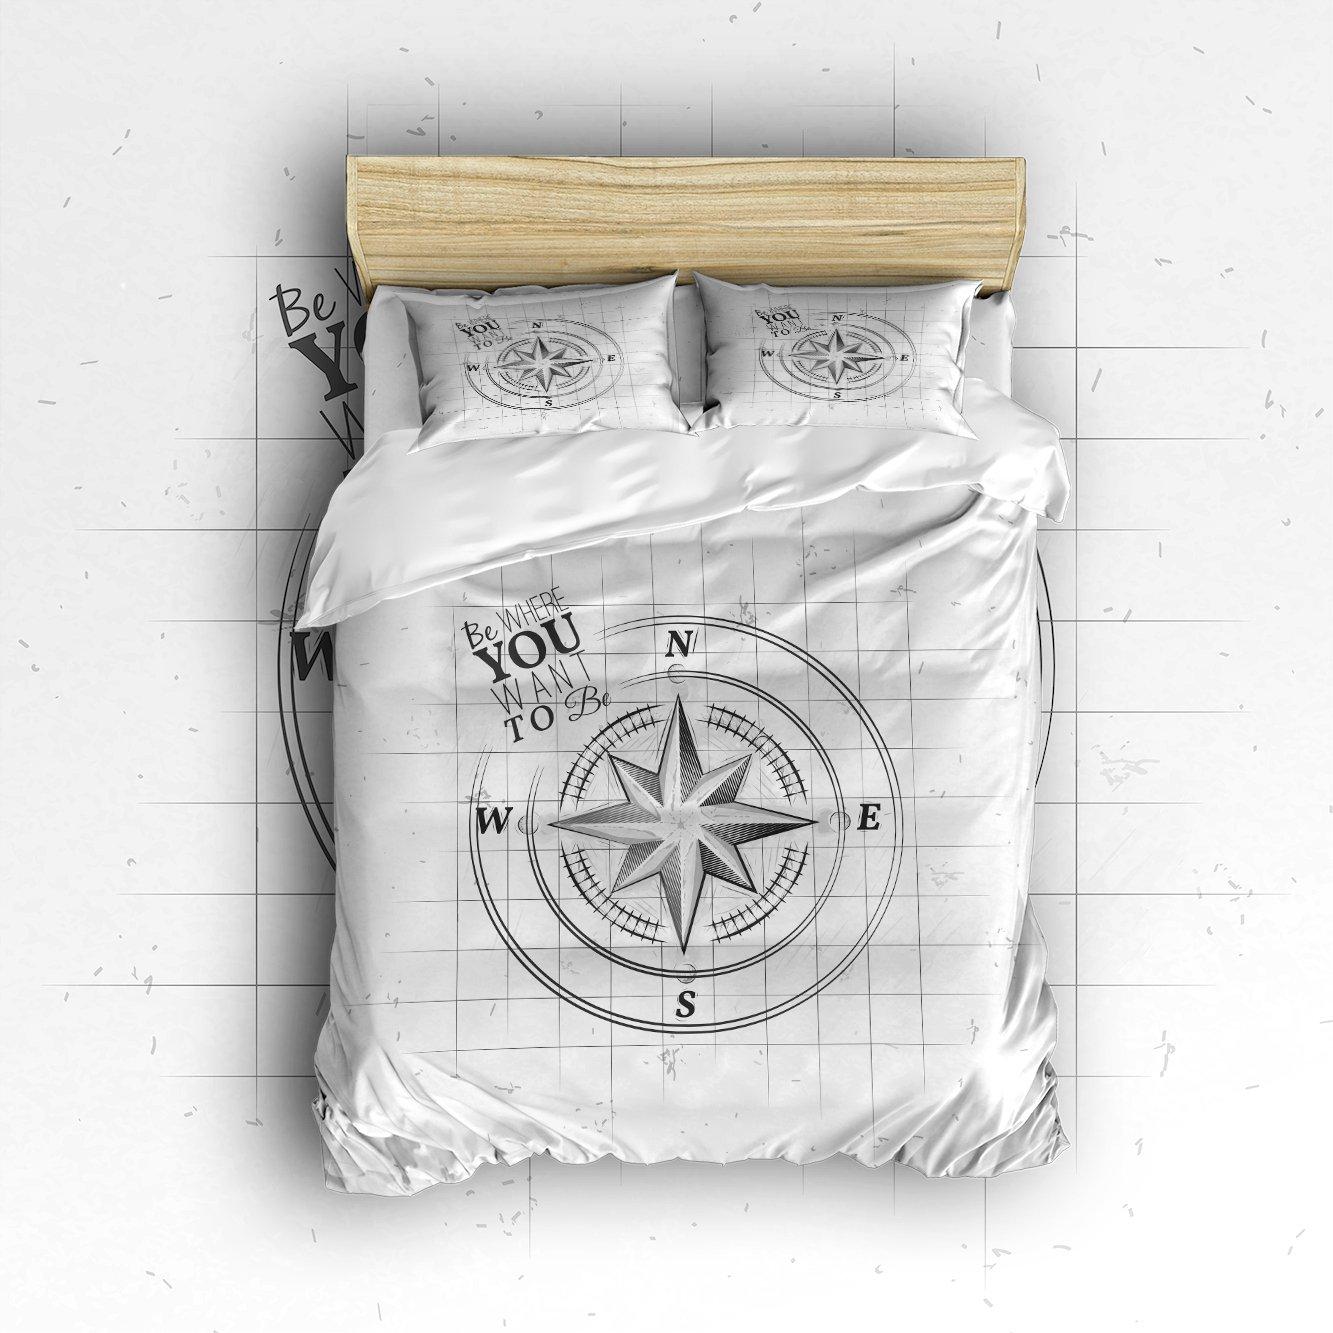 Beauty Decor Bedding 4 Piece bed Set Duvet Cover,compass pattern 4 Piece Bed Sheet Set 1 Flat Sheet 1 Fitted Sheet and 29 Pillow Cases